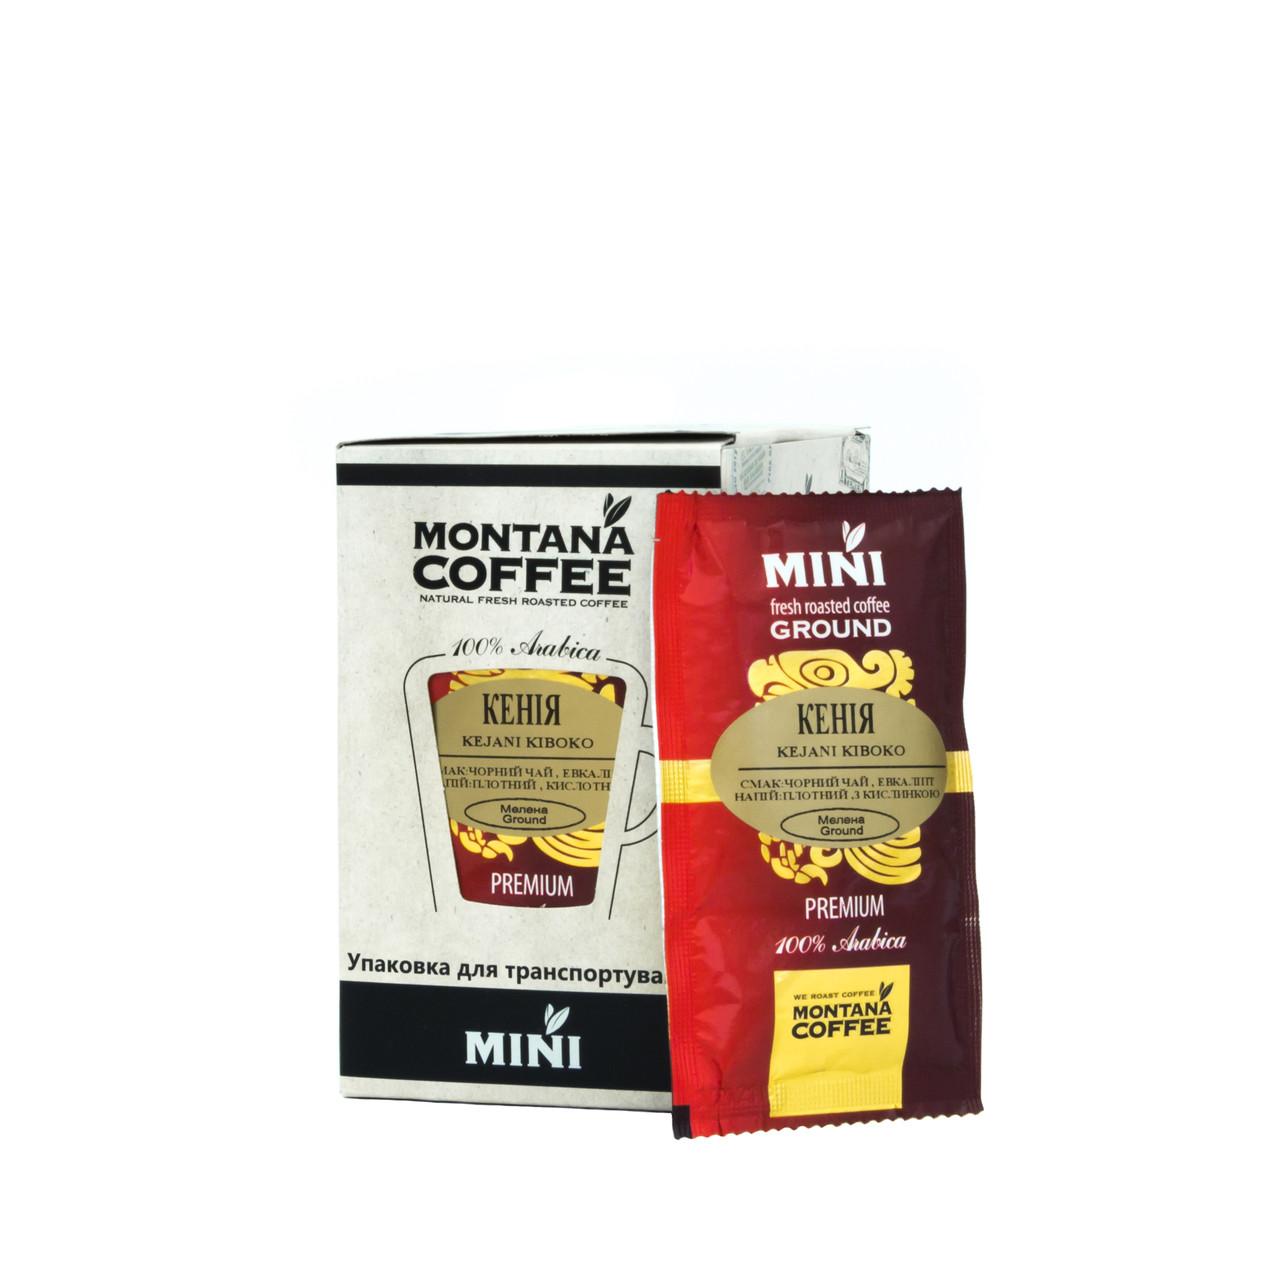 Кения Kejani Kiboko Montana coffee MINI 20 шт